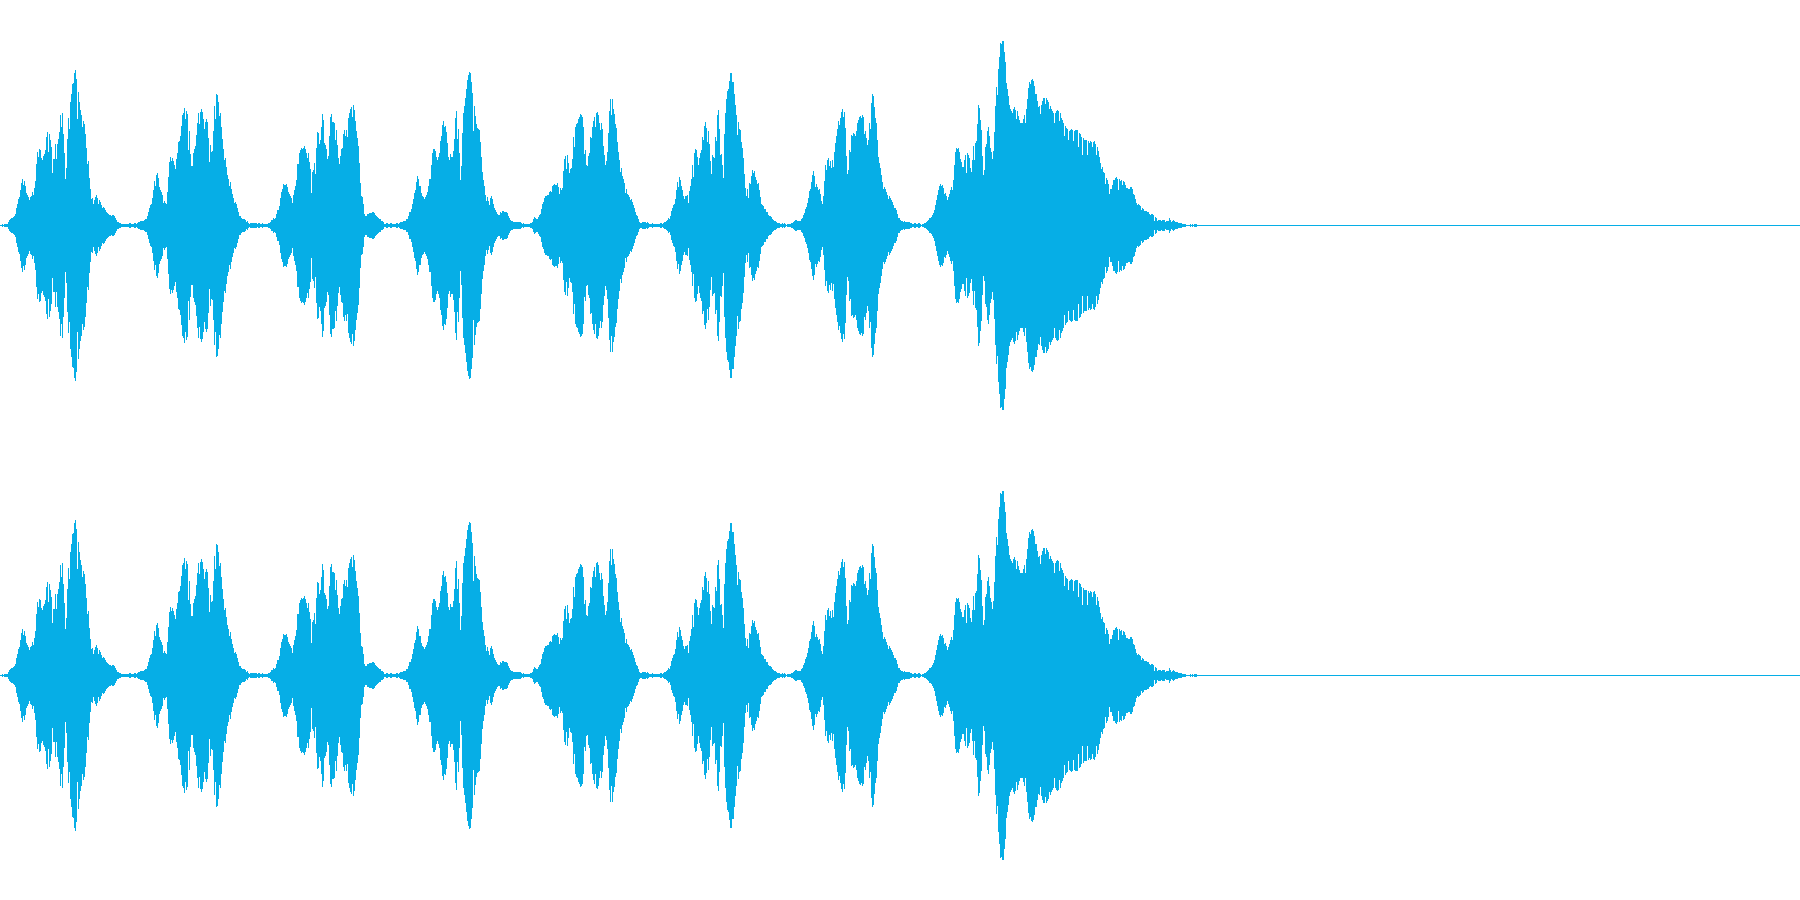 KANニャニャニャ自主規制音4shortの再生済みの波形